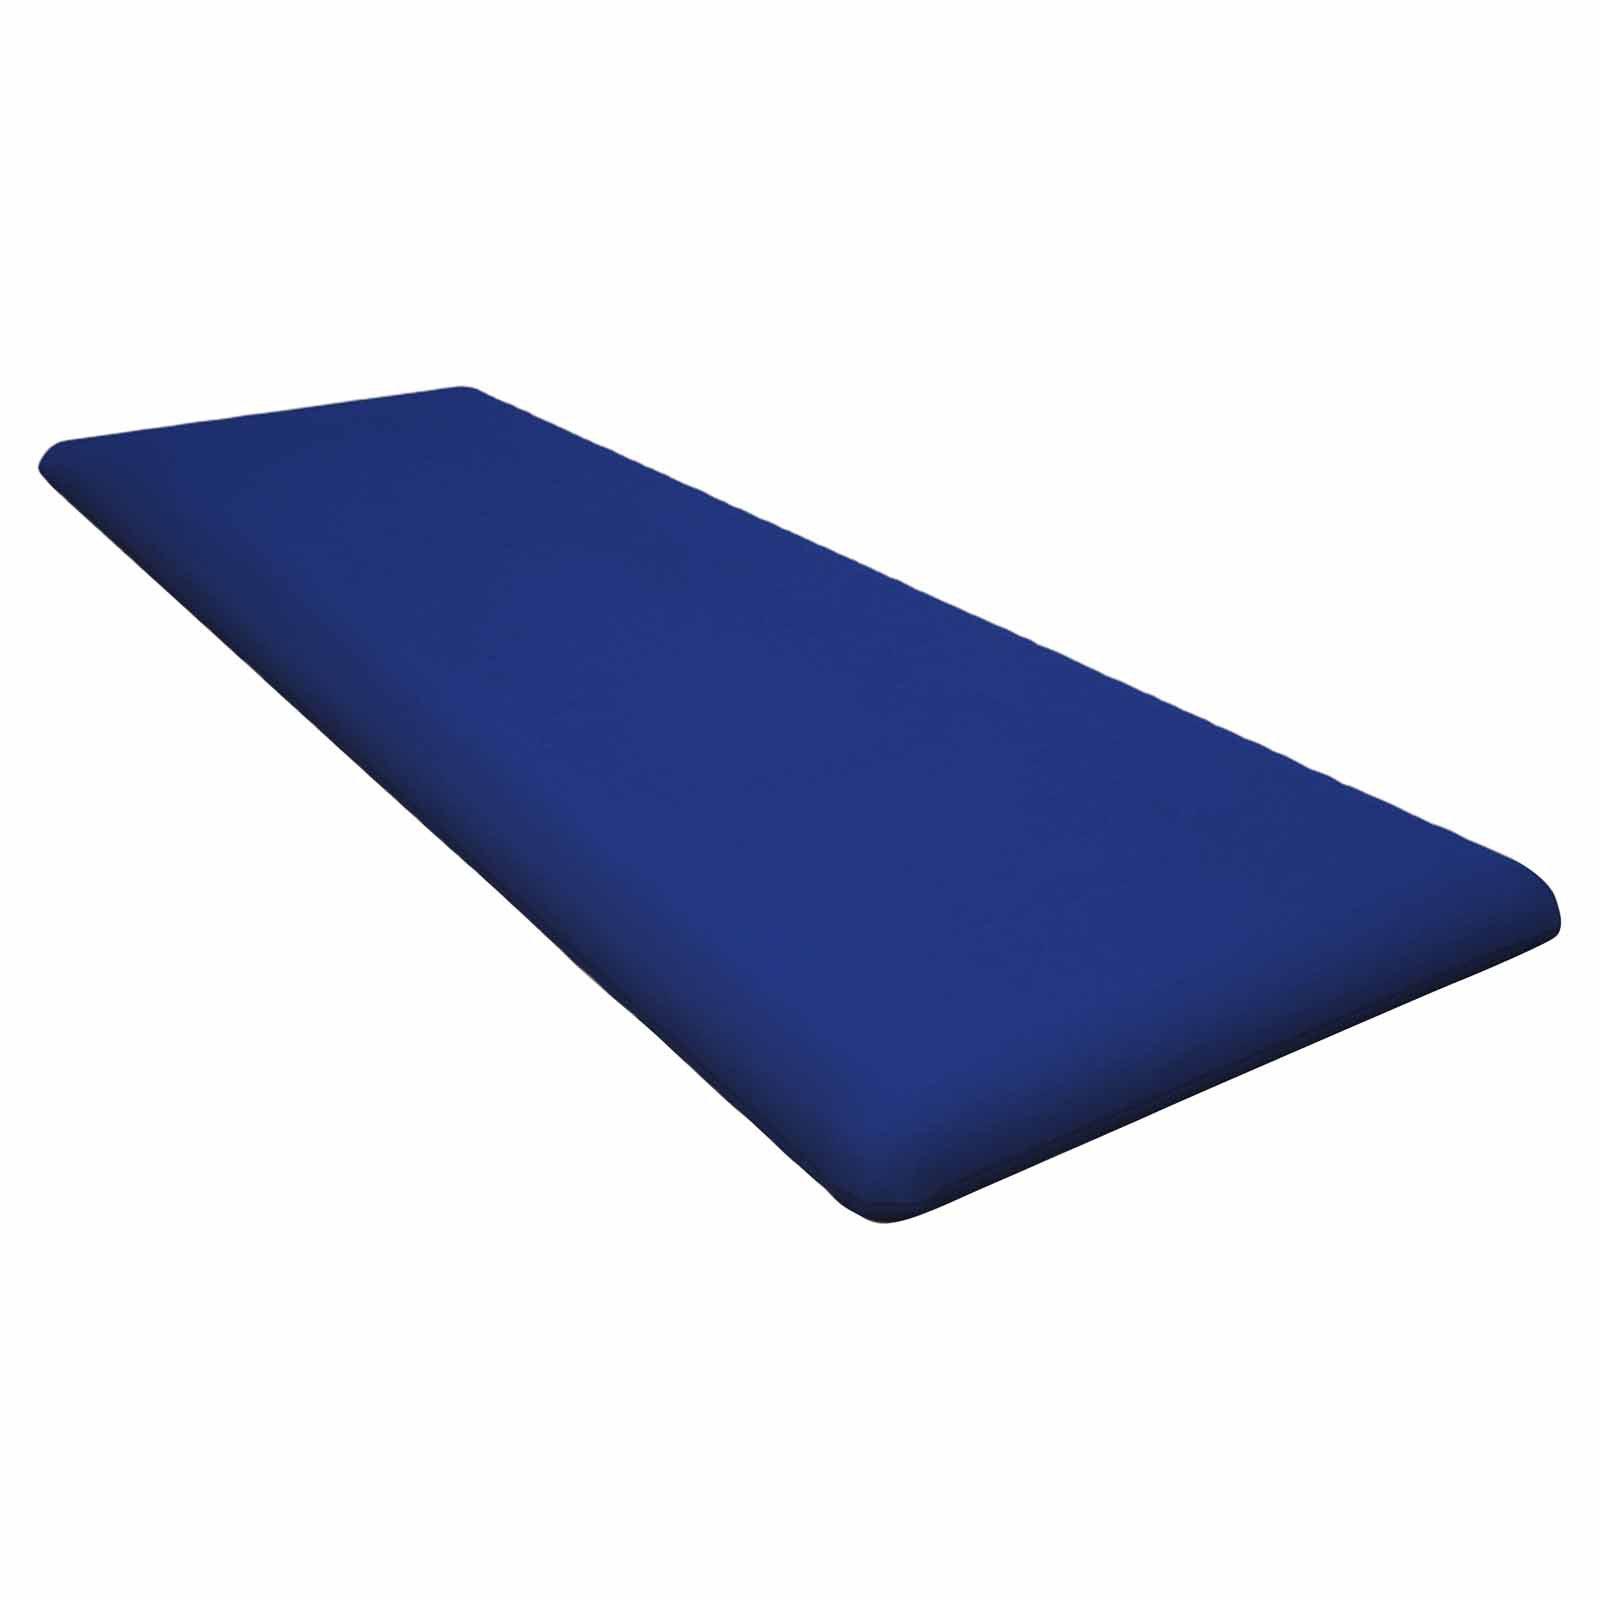 POLYWOOD® Sunbrella 55.5 x 18.5 in. Bench Seat Cushion